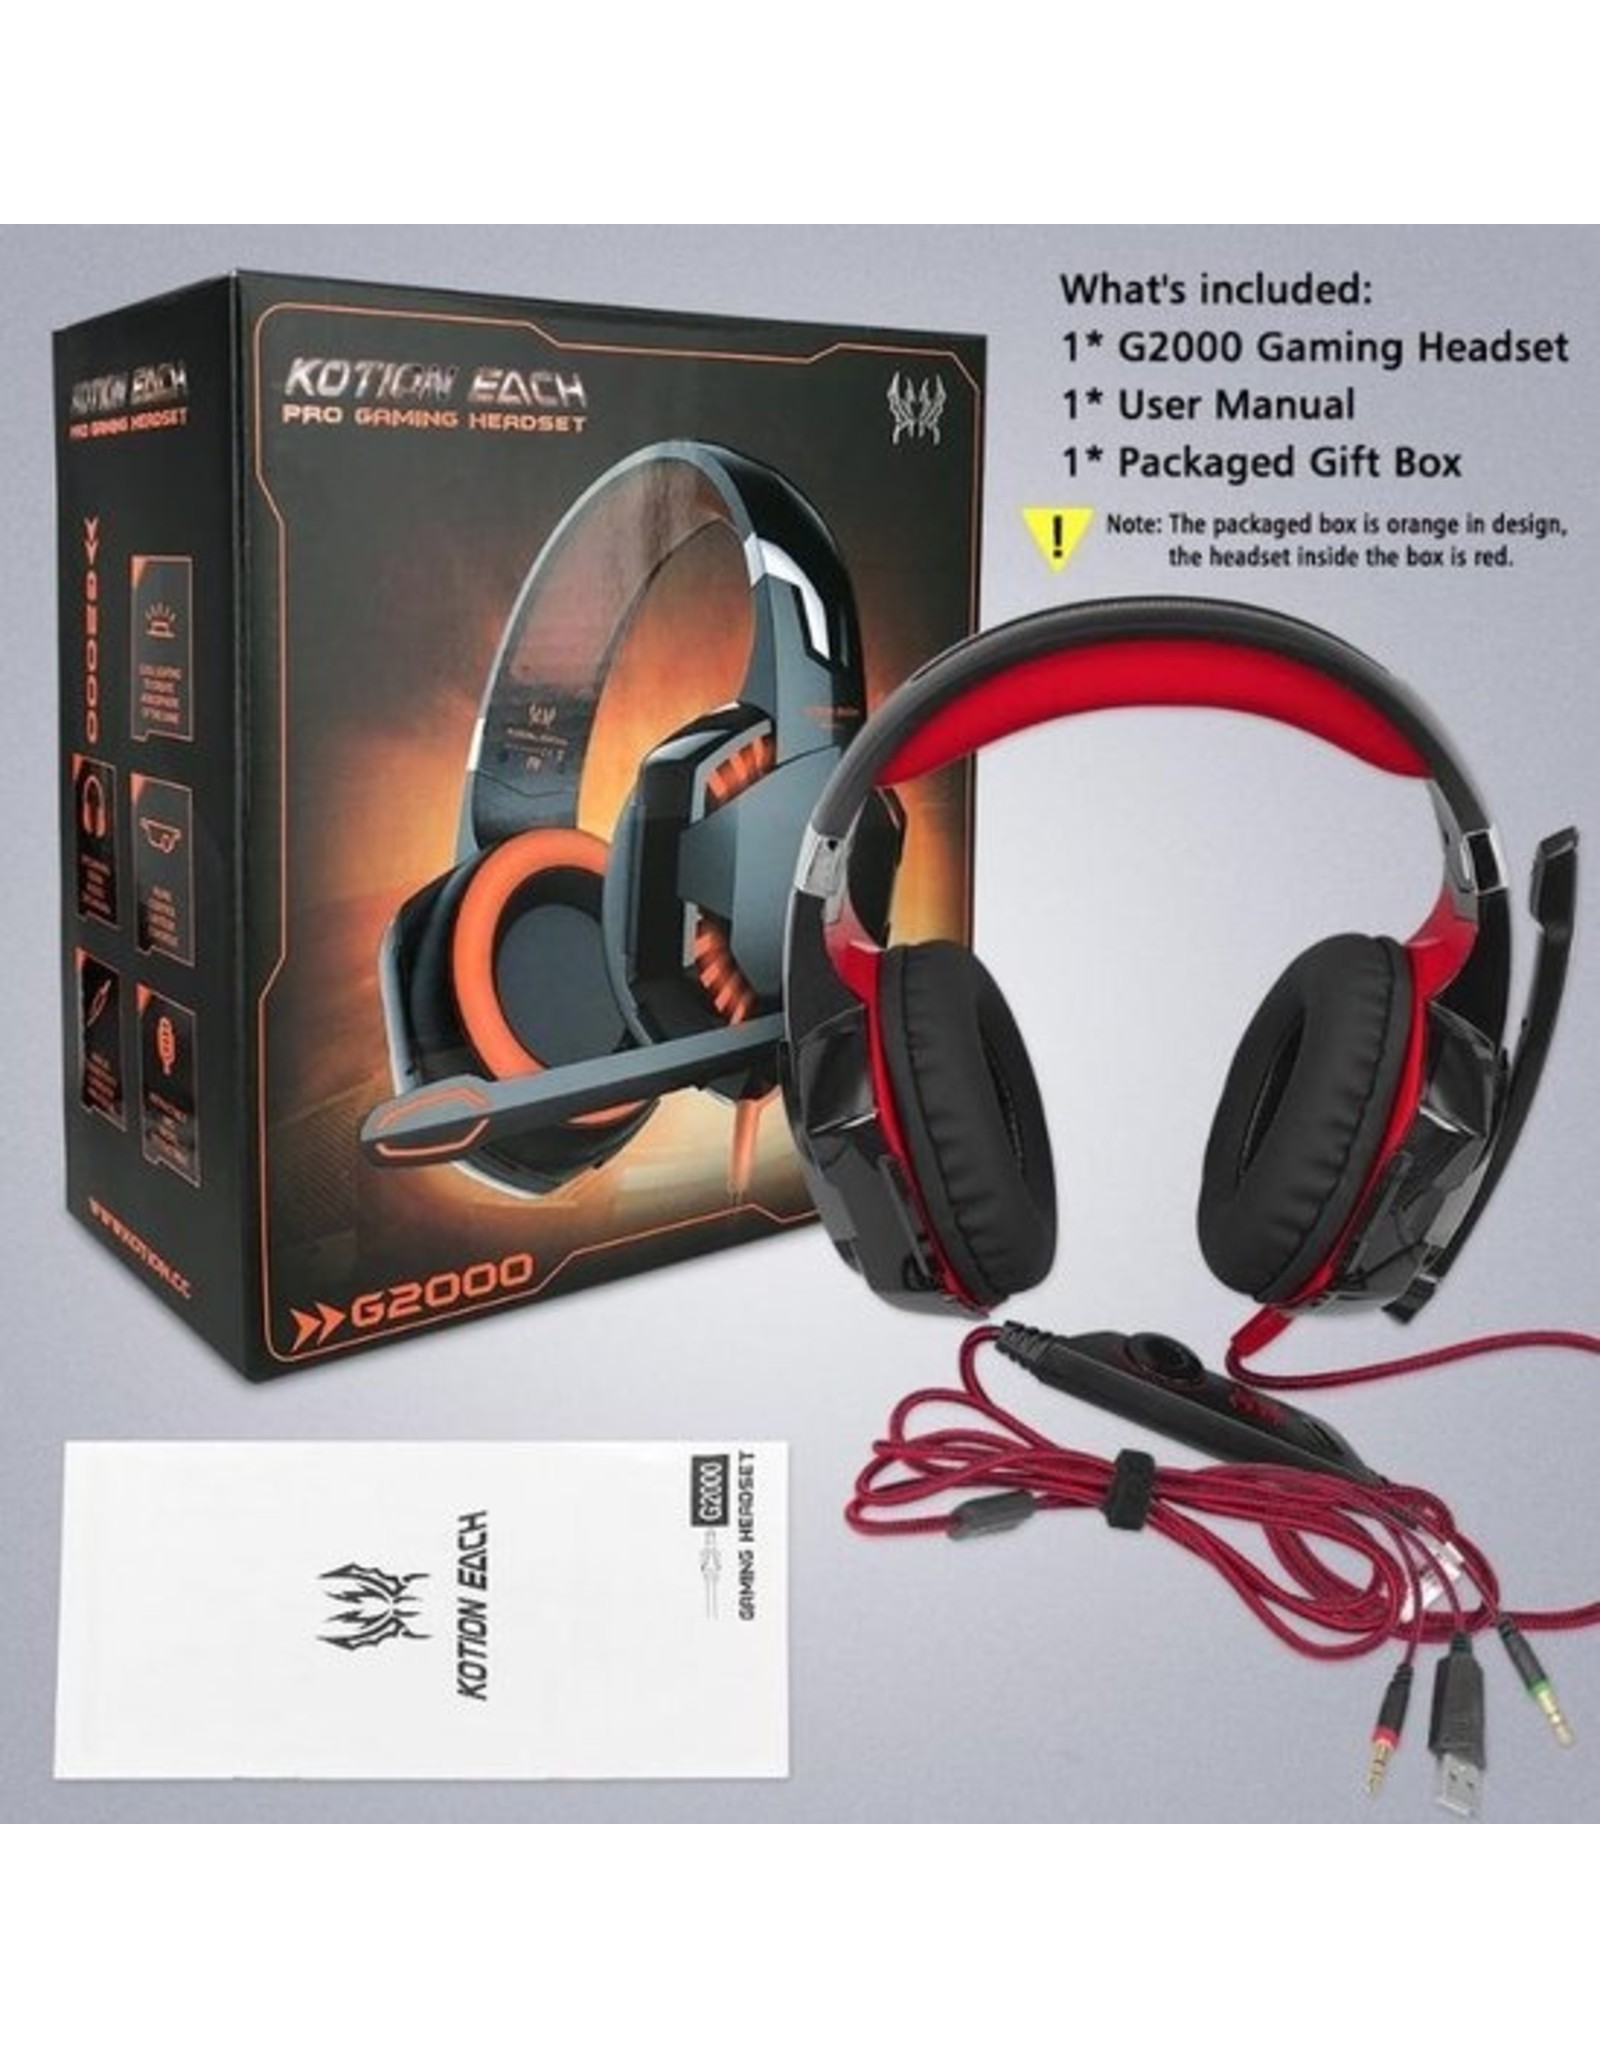 Parya Official Kotion Each - Headset - Zwart/Rood - EV